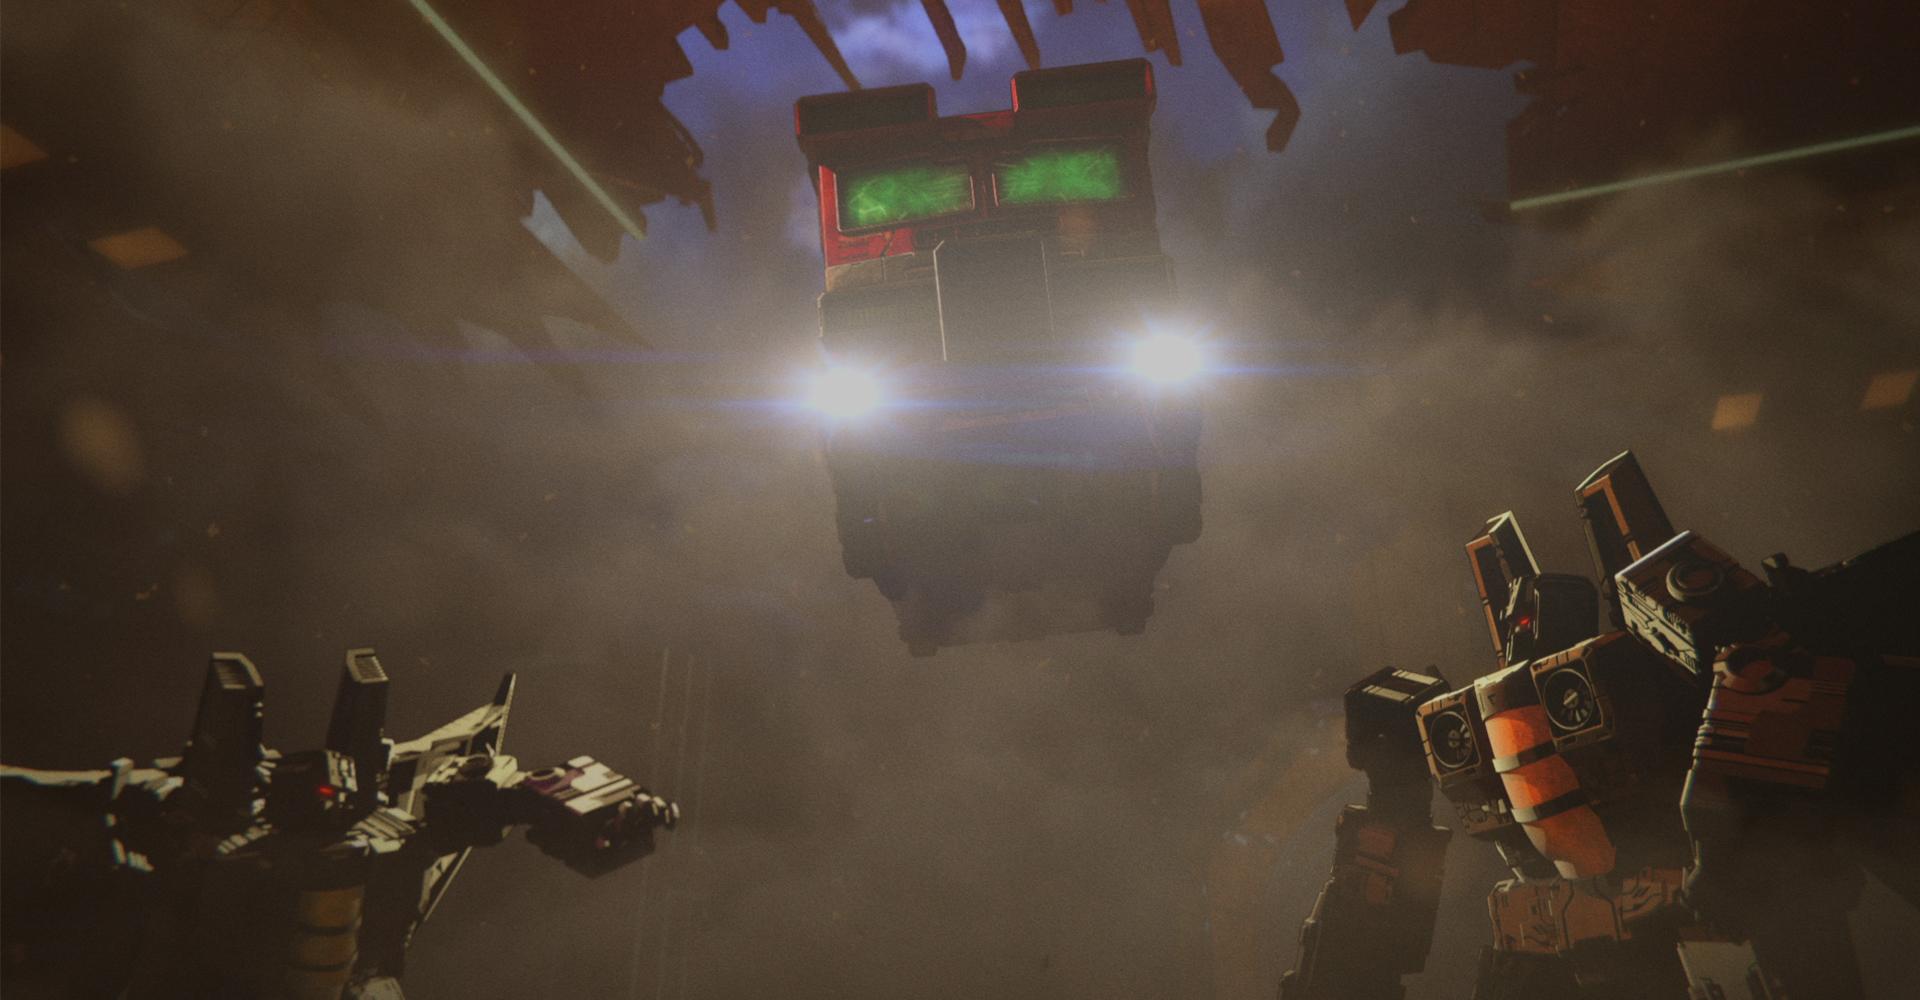 Bild aus Transformers: War for cybertron